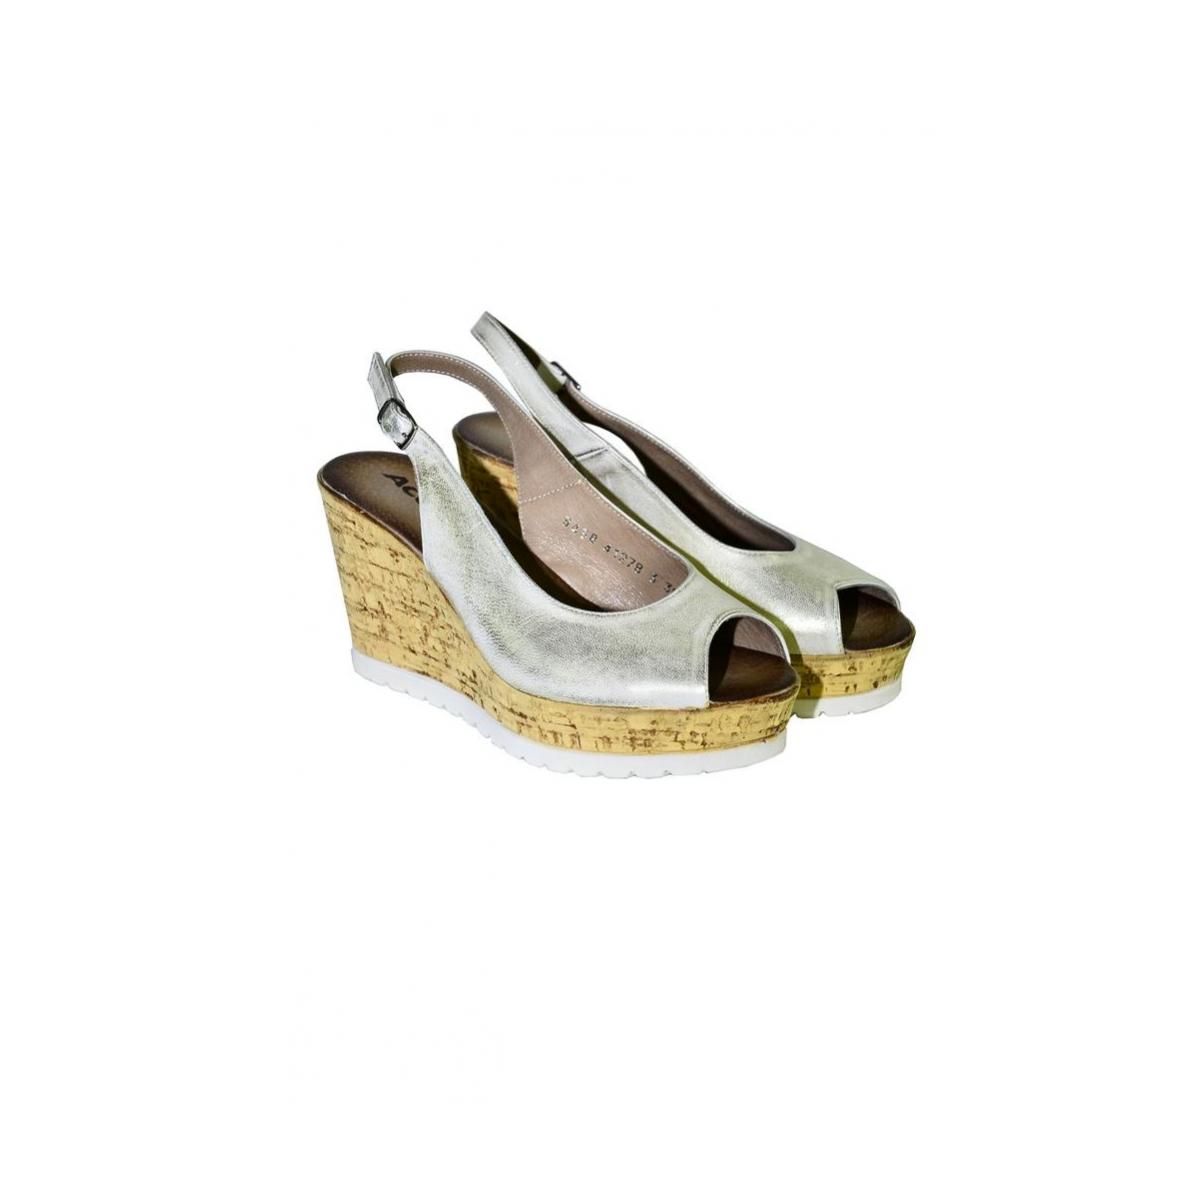 5ab490647662 Dámske letné zlaté sandále NETANA - 2